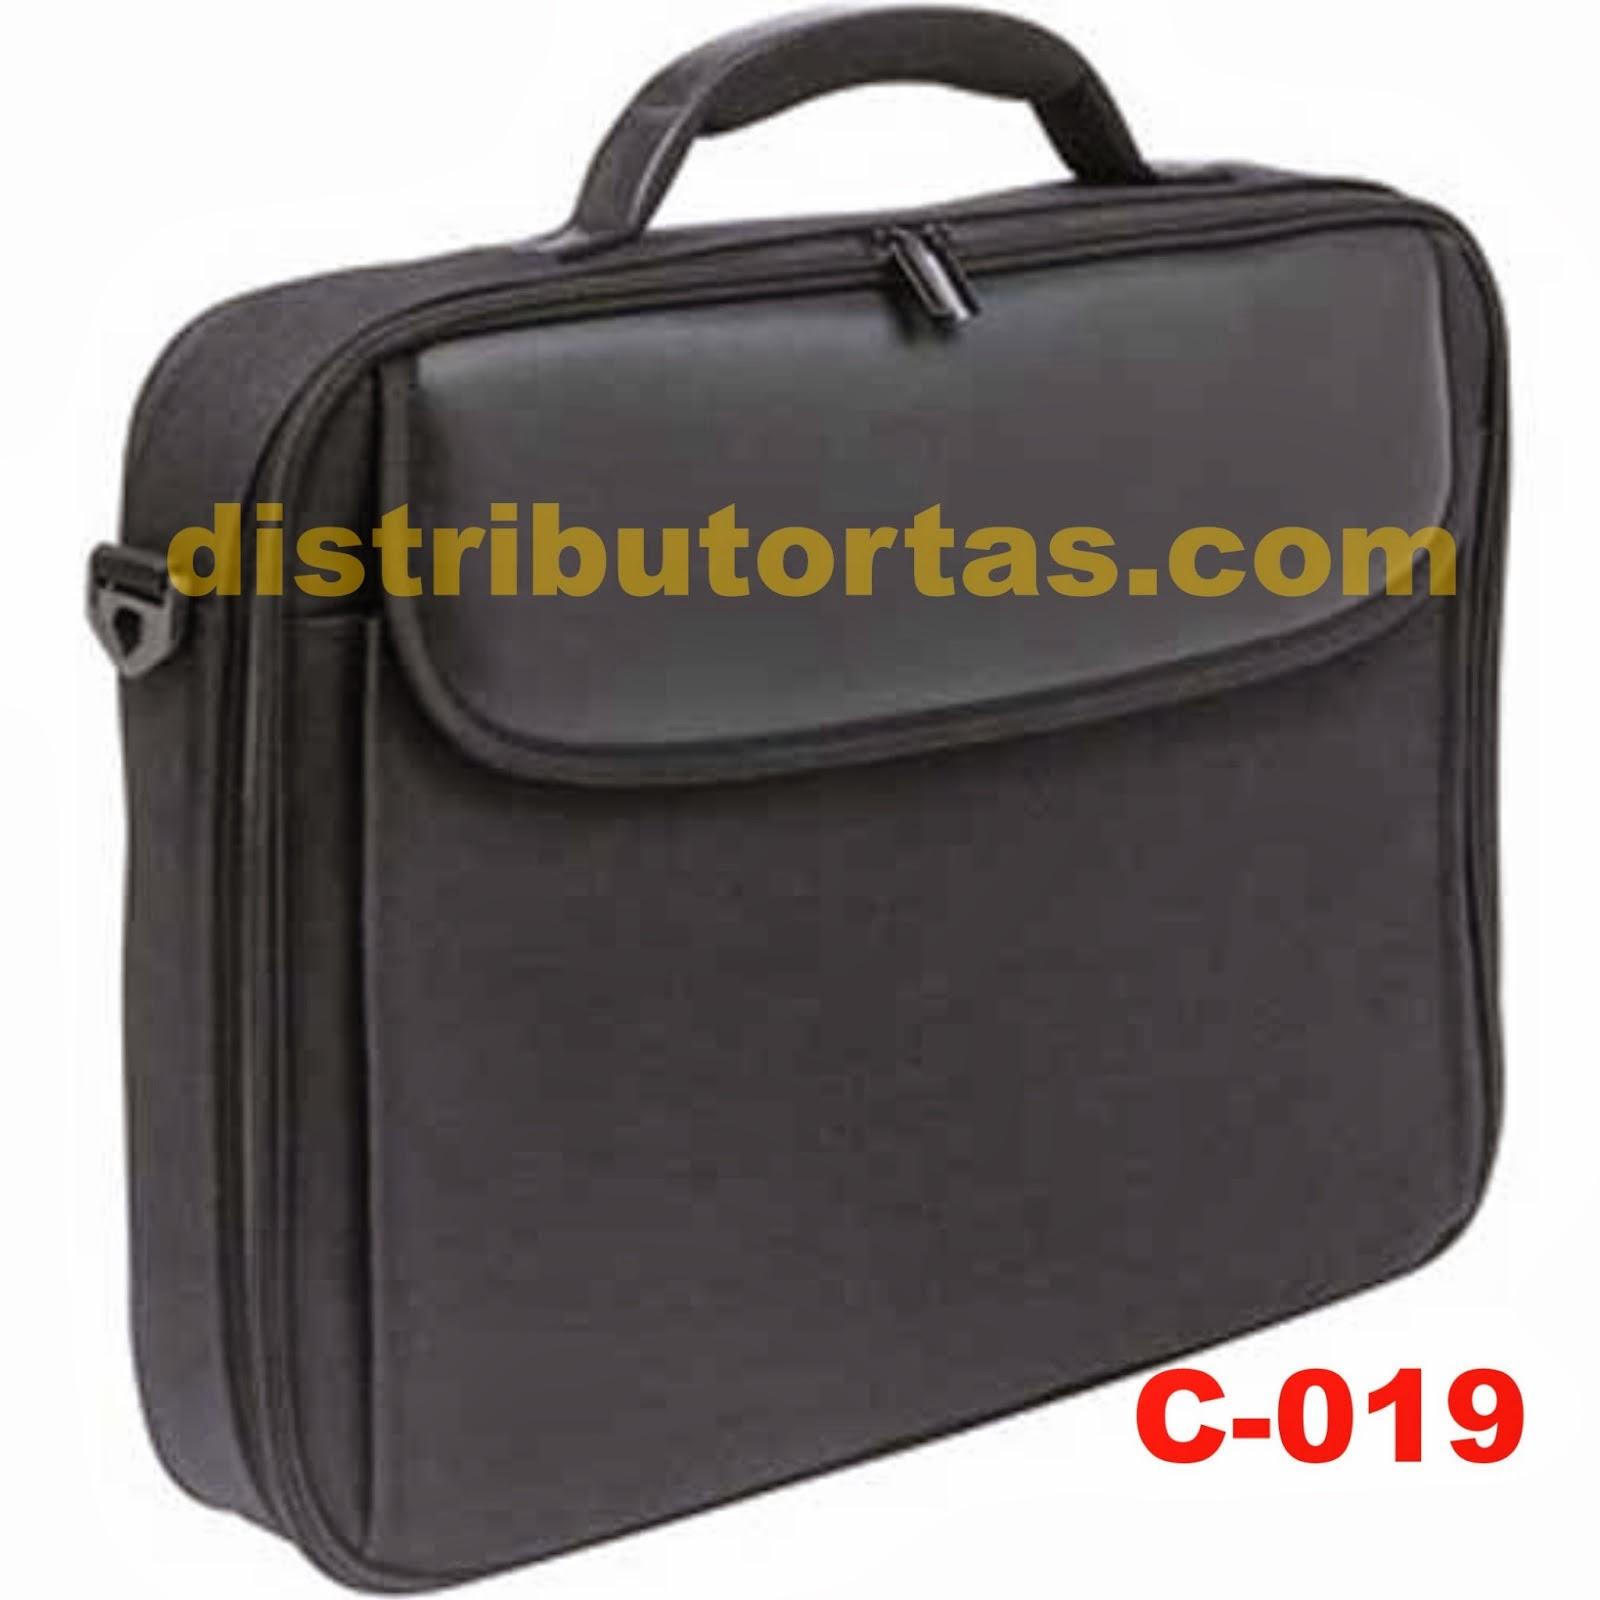 Harga Jual Tas Eiger Surabaya Ls Diario Canvas 24l Laptop Ransel Di